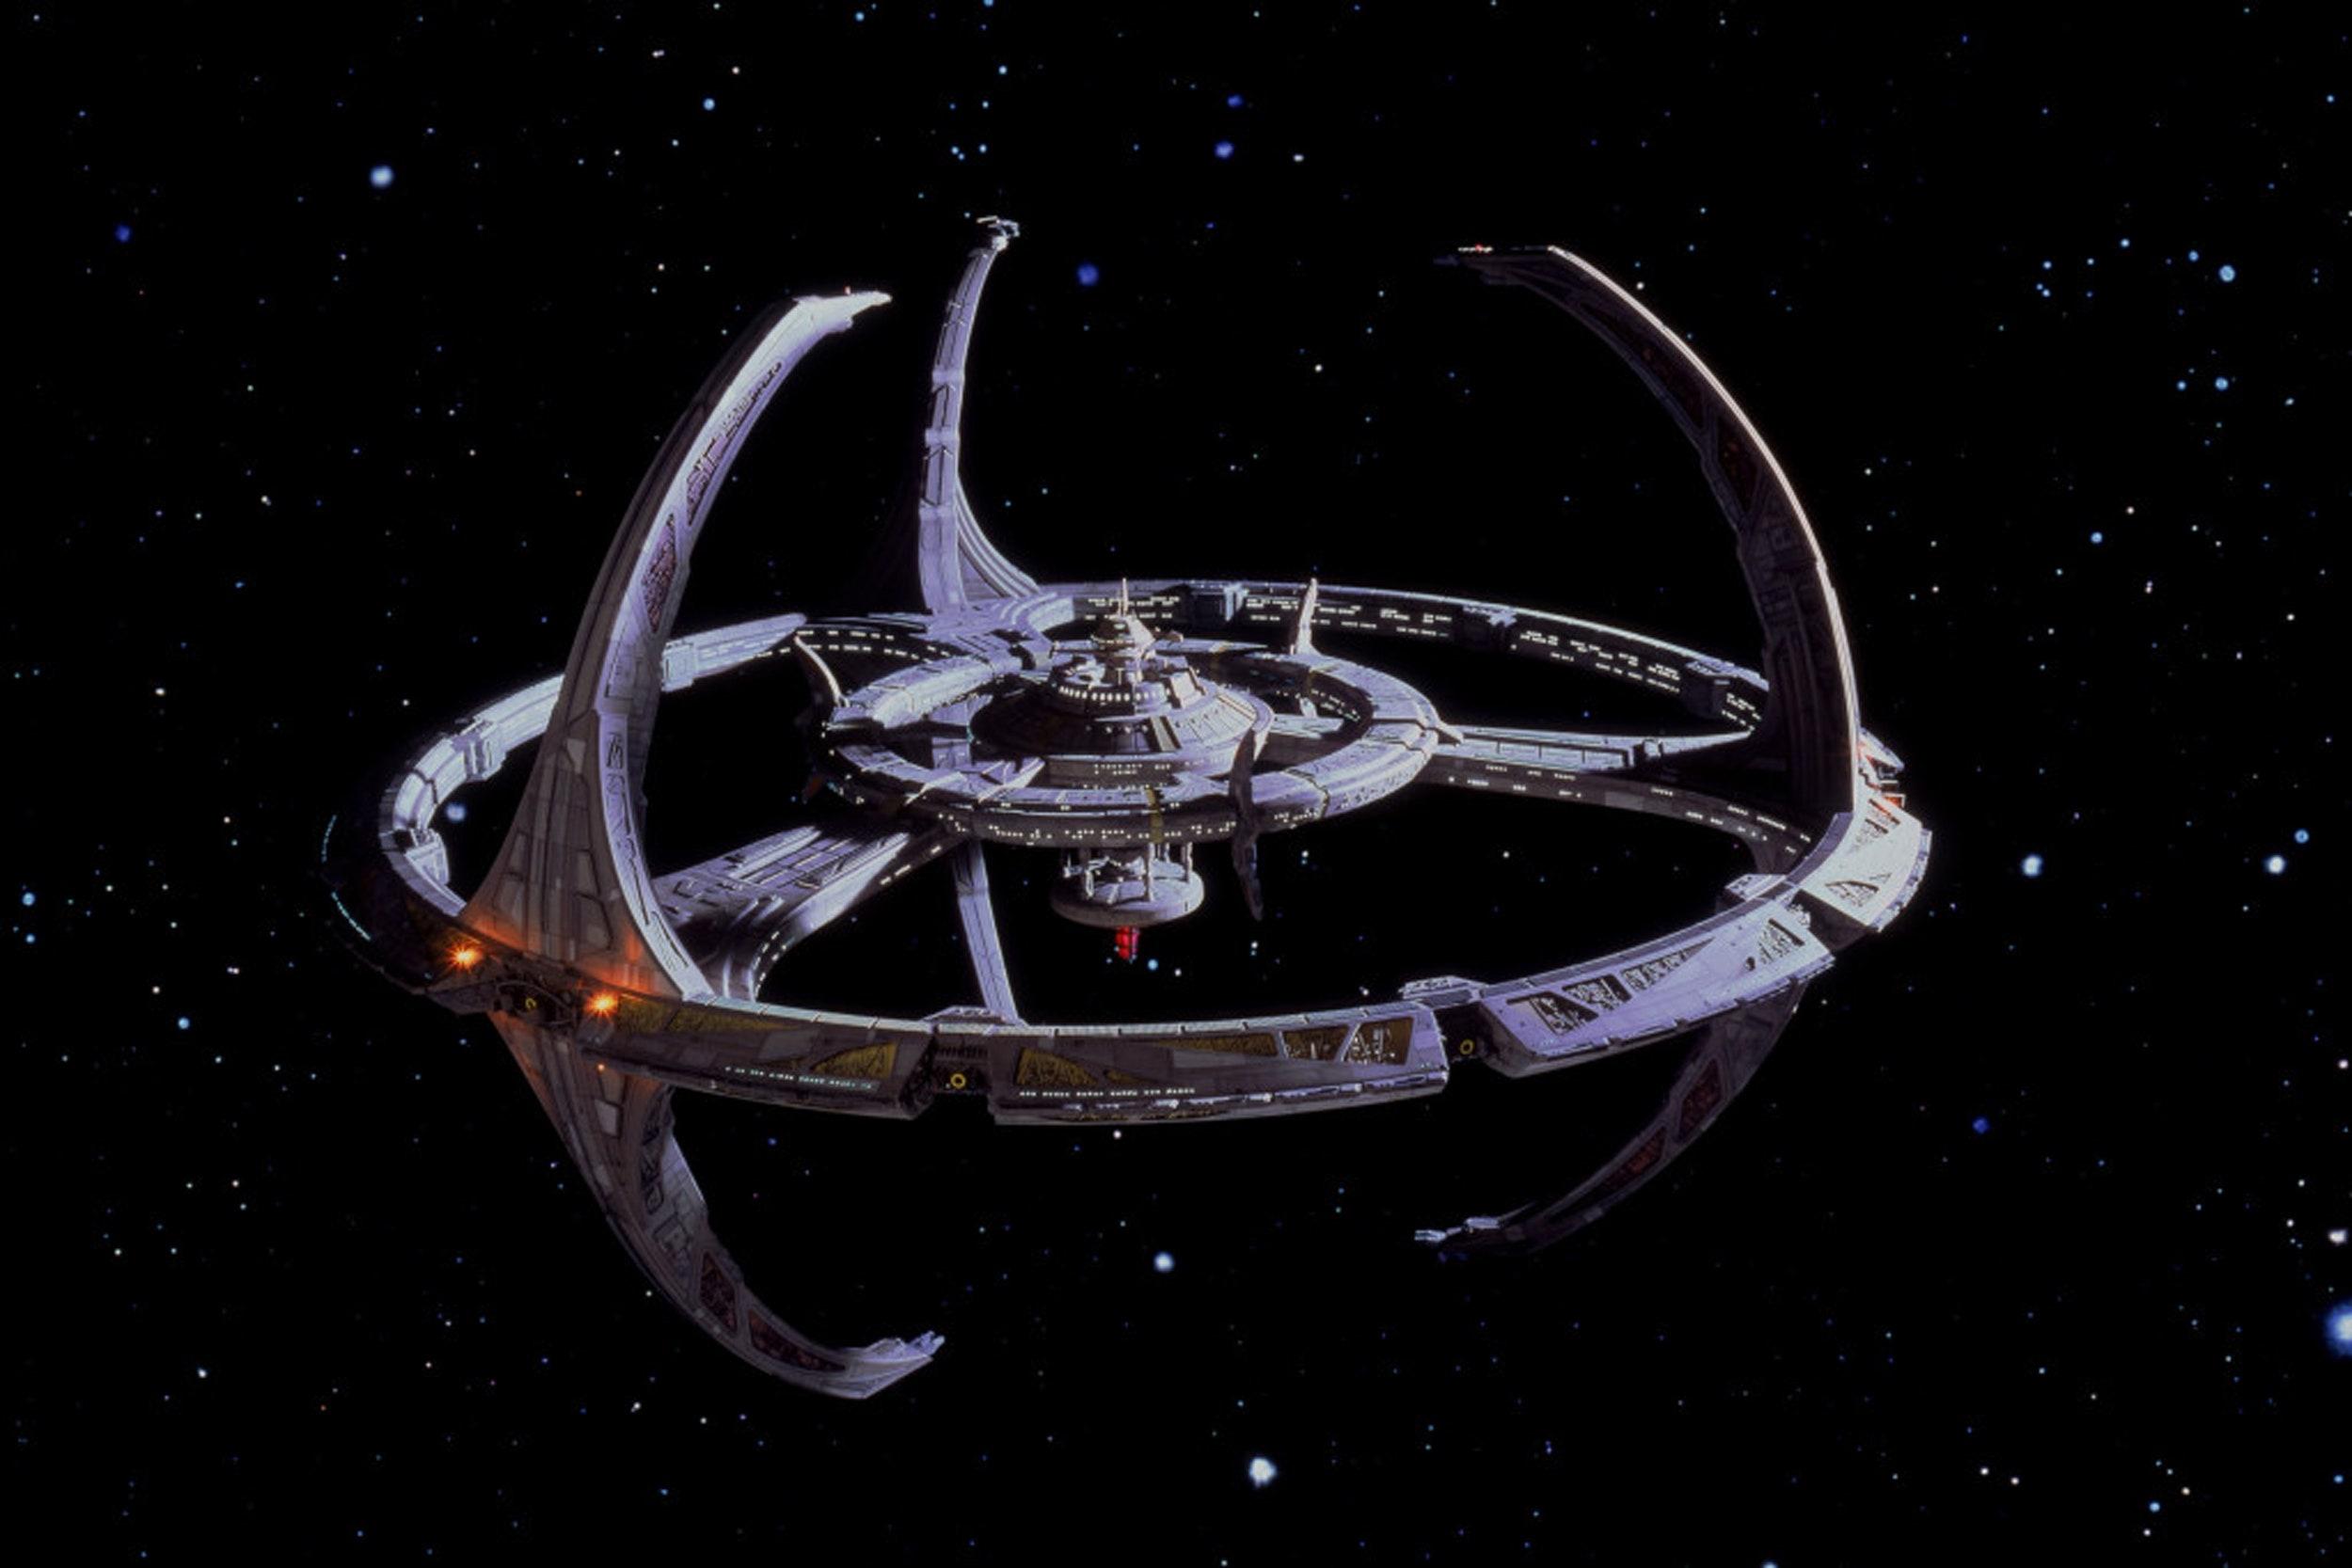 The station Deep Space Nine